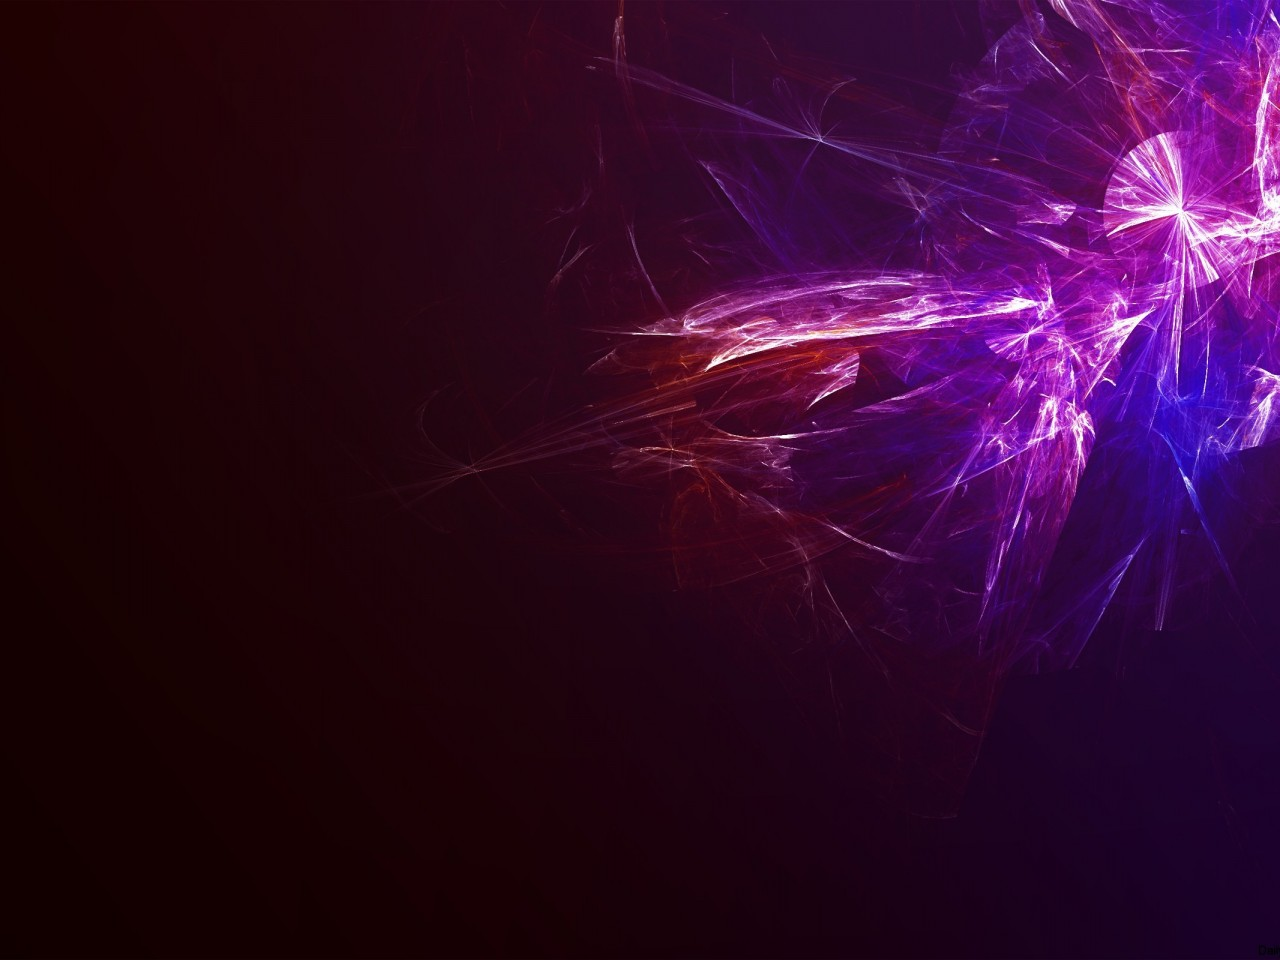 Dynamic Wallpaper Iphone X Cellophane Purple Hd Wallpapers